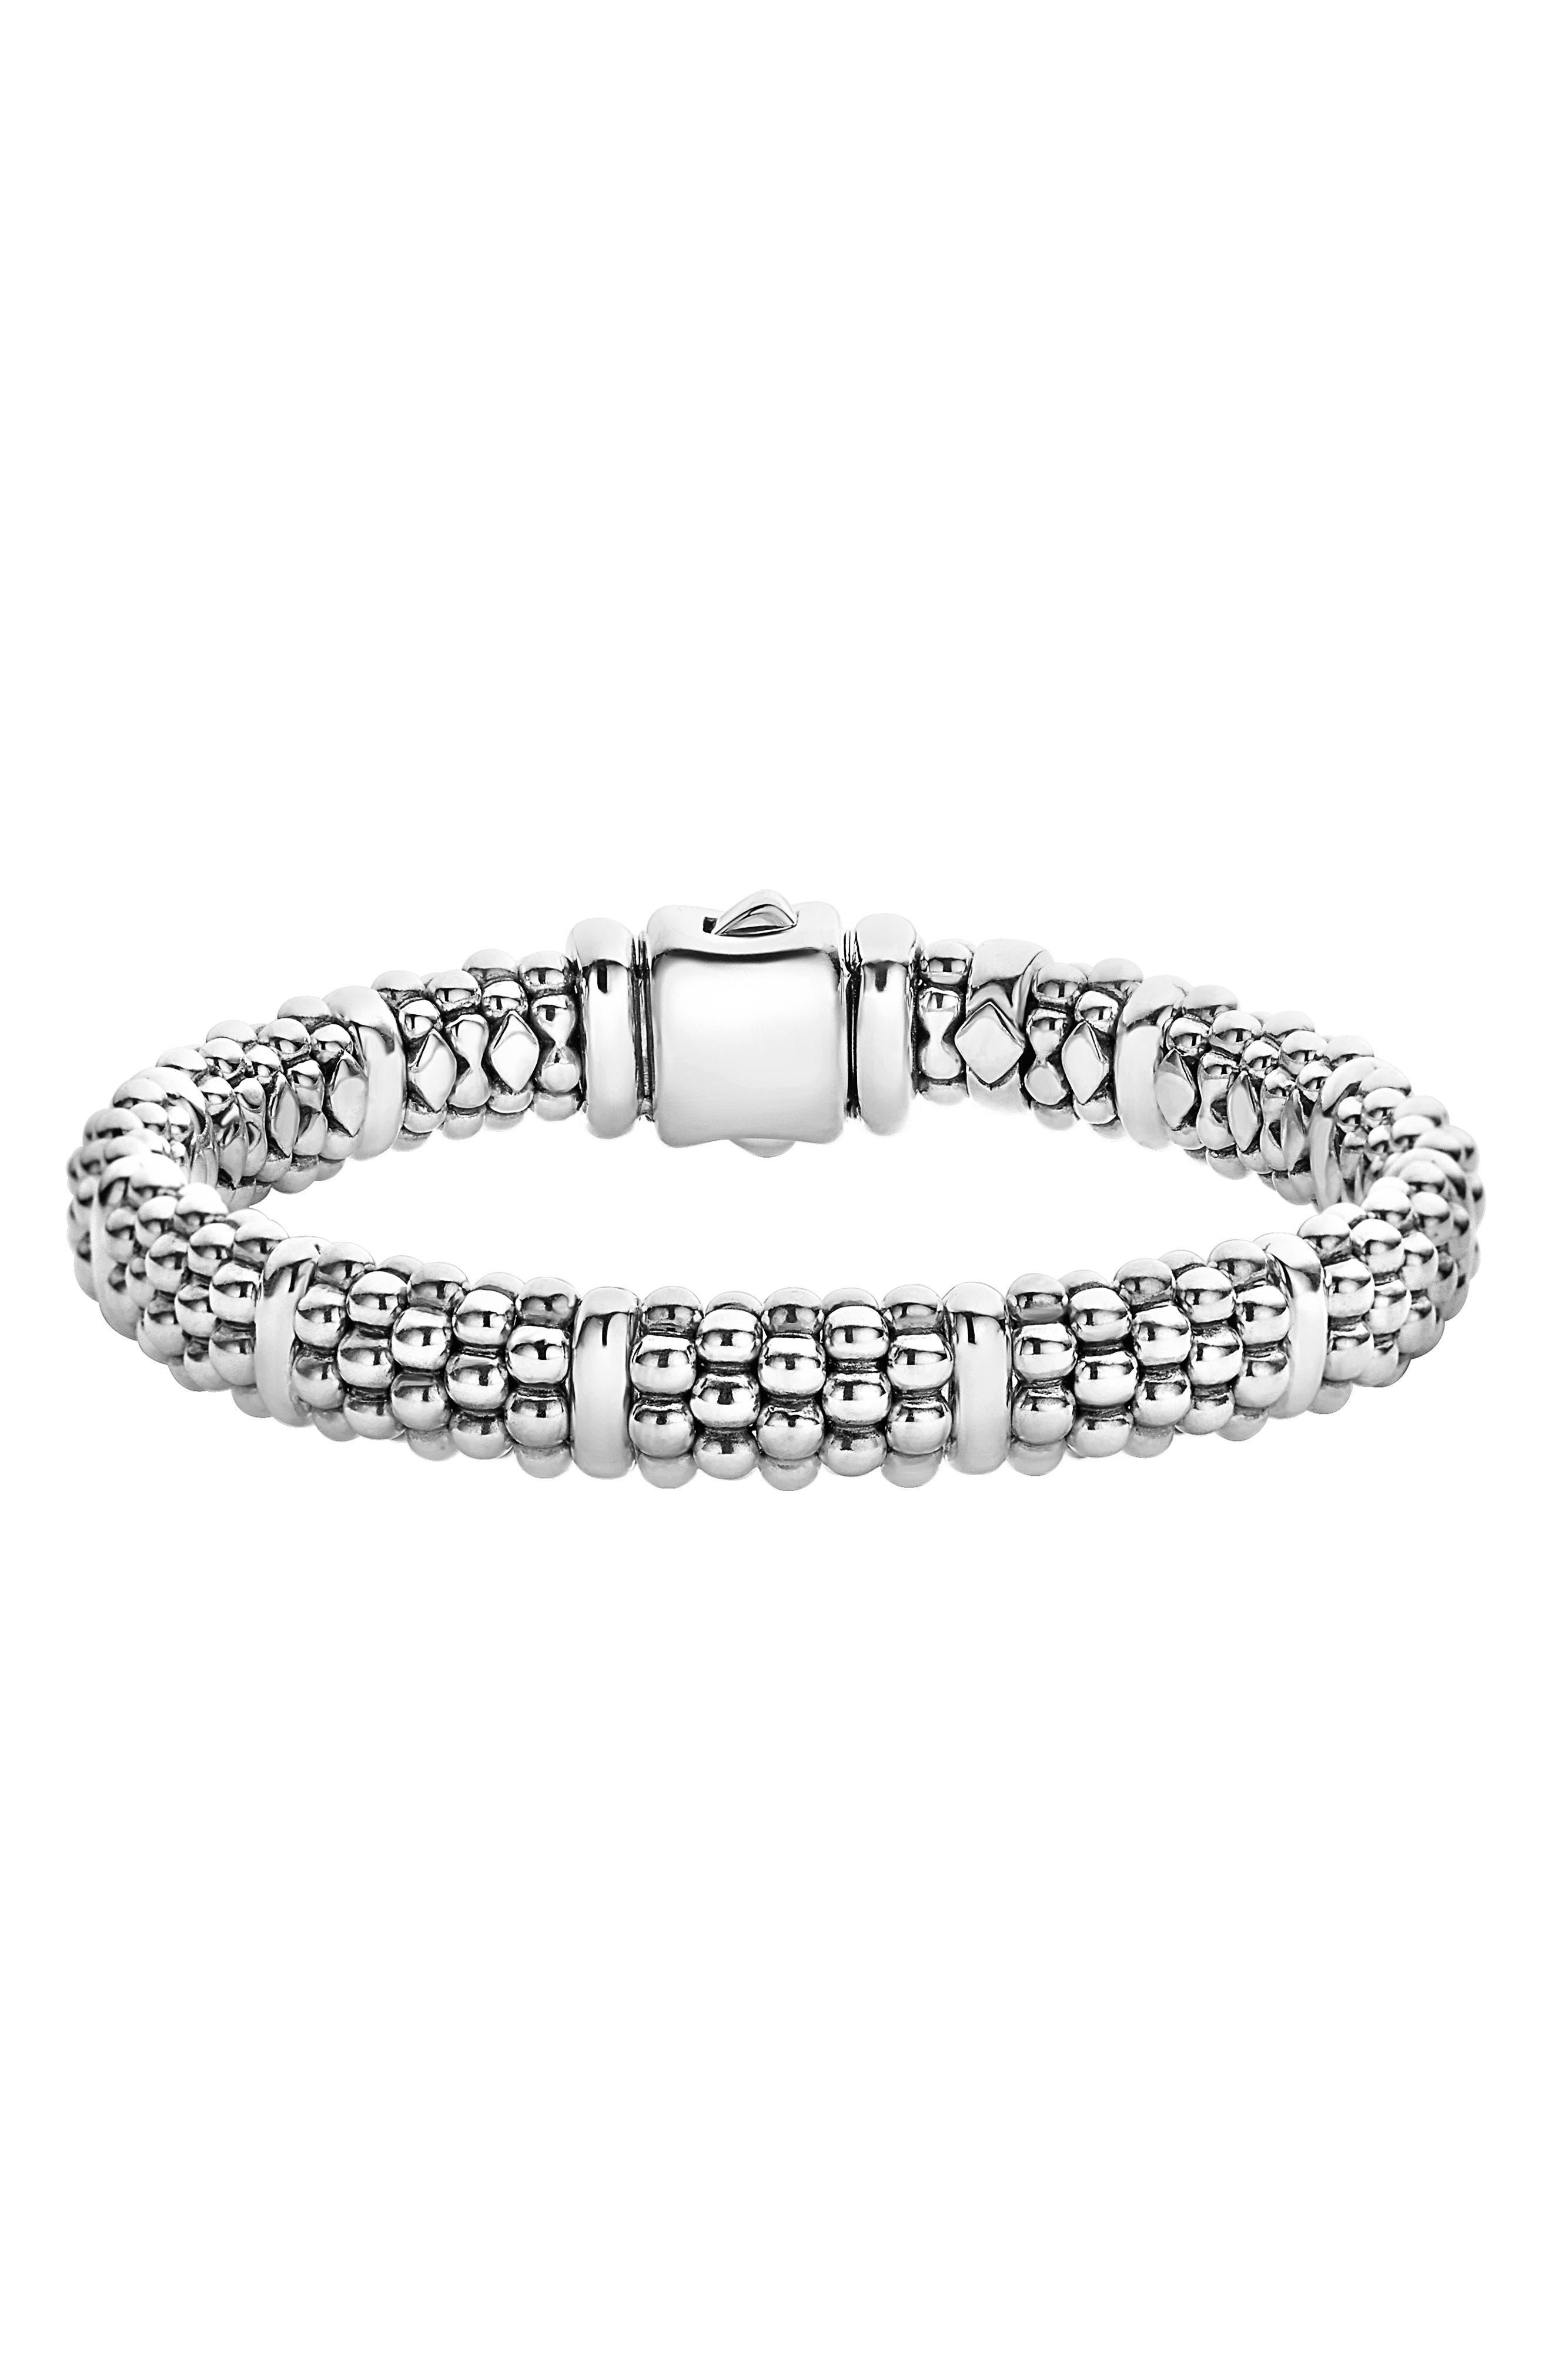 LAGOS Oval Rope Caviar Bracelet, Main, color, SILVER